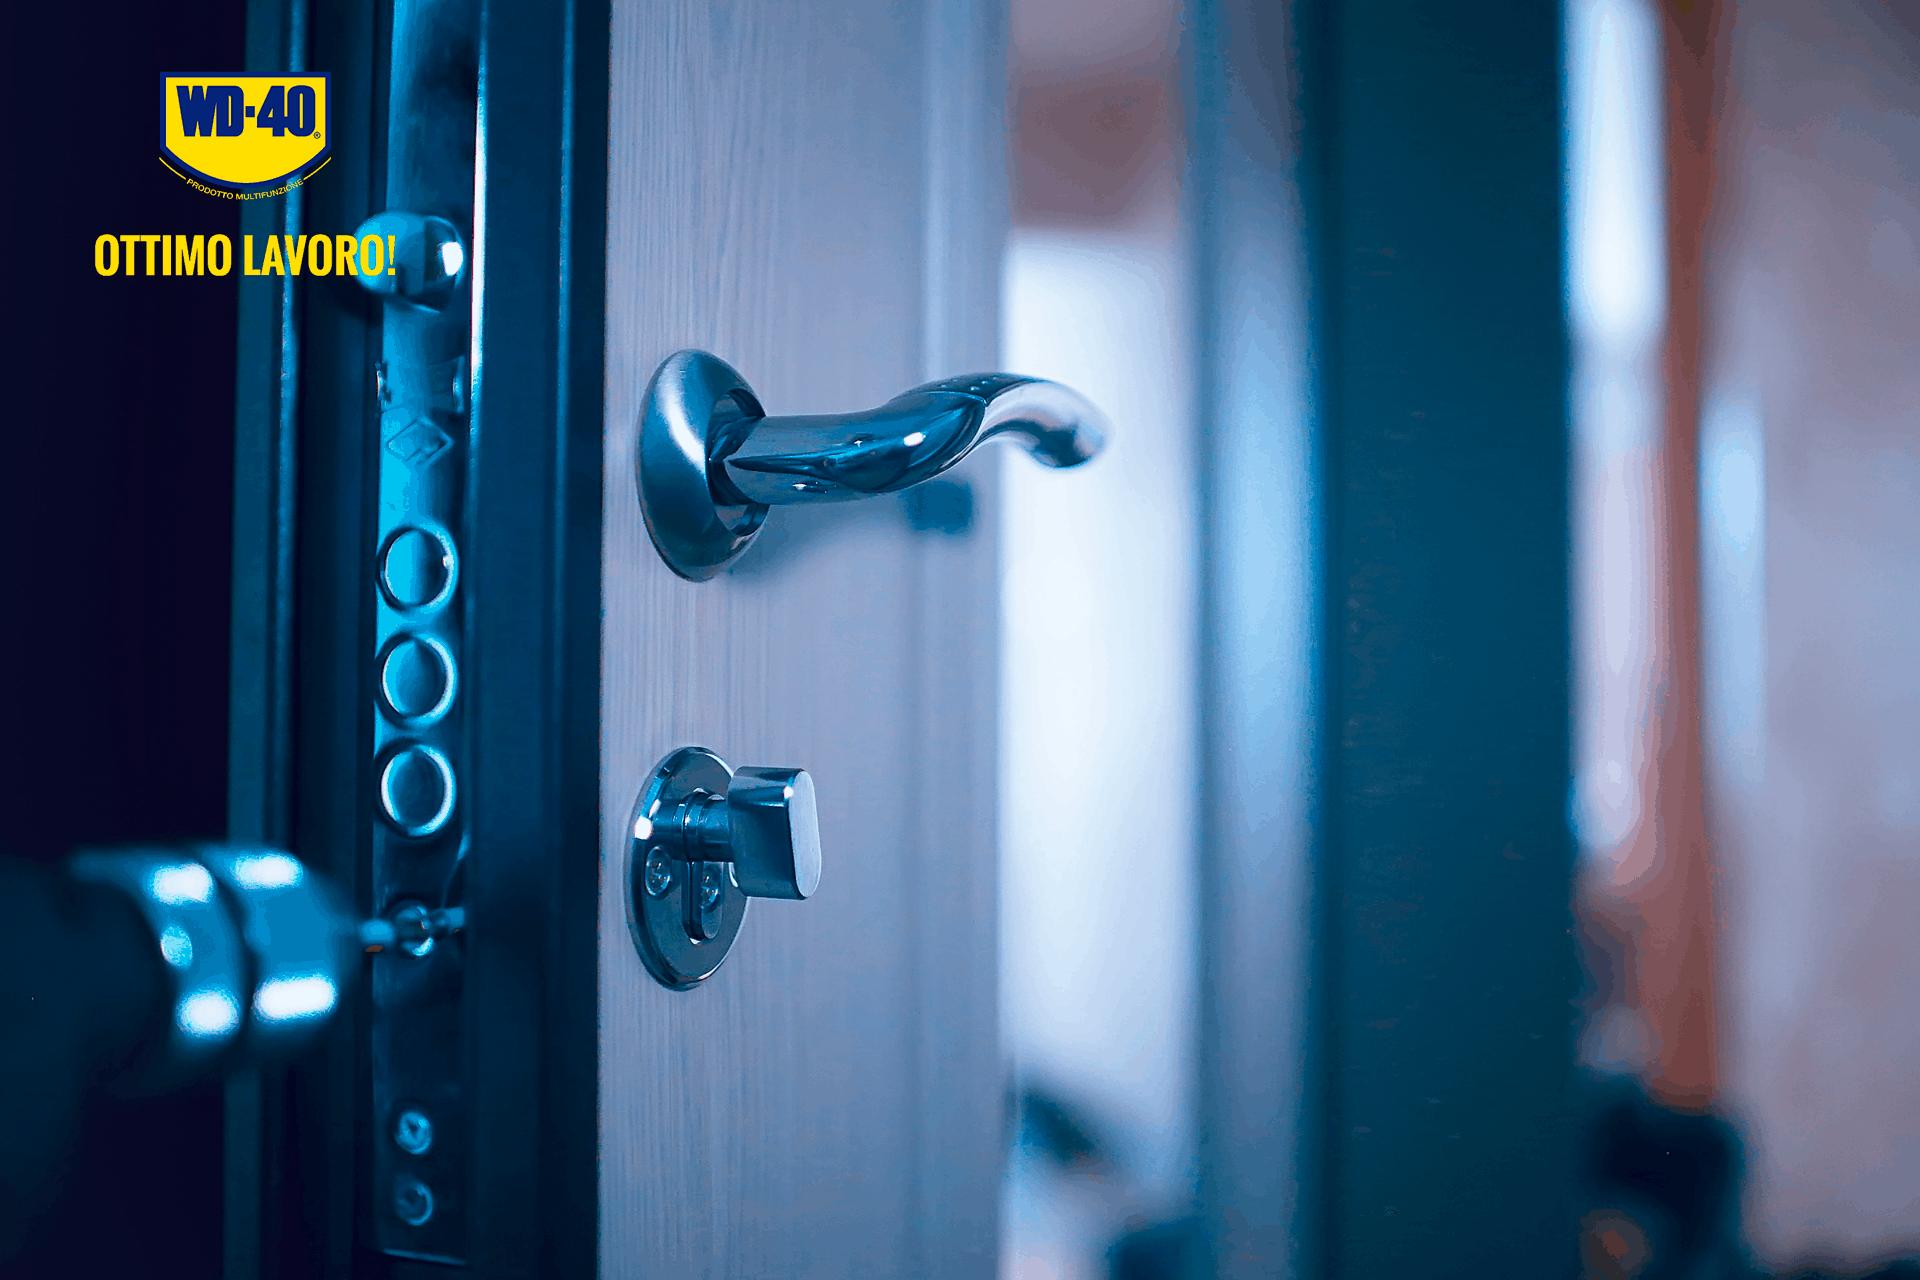 lubrificare serratura porta blindata